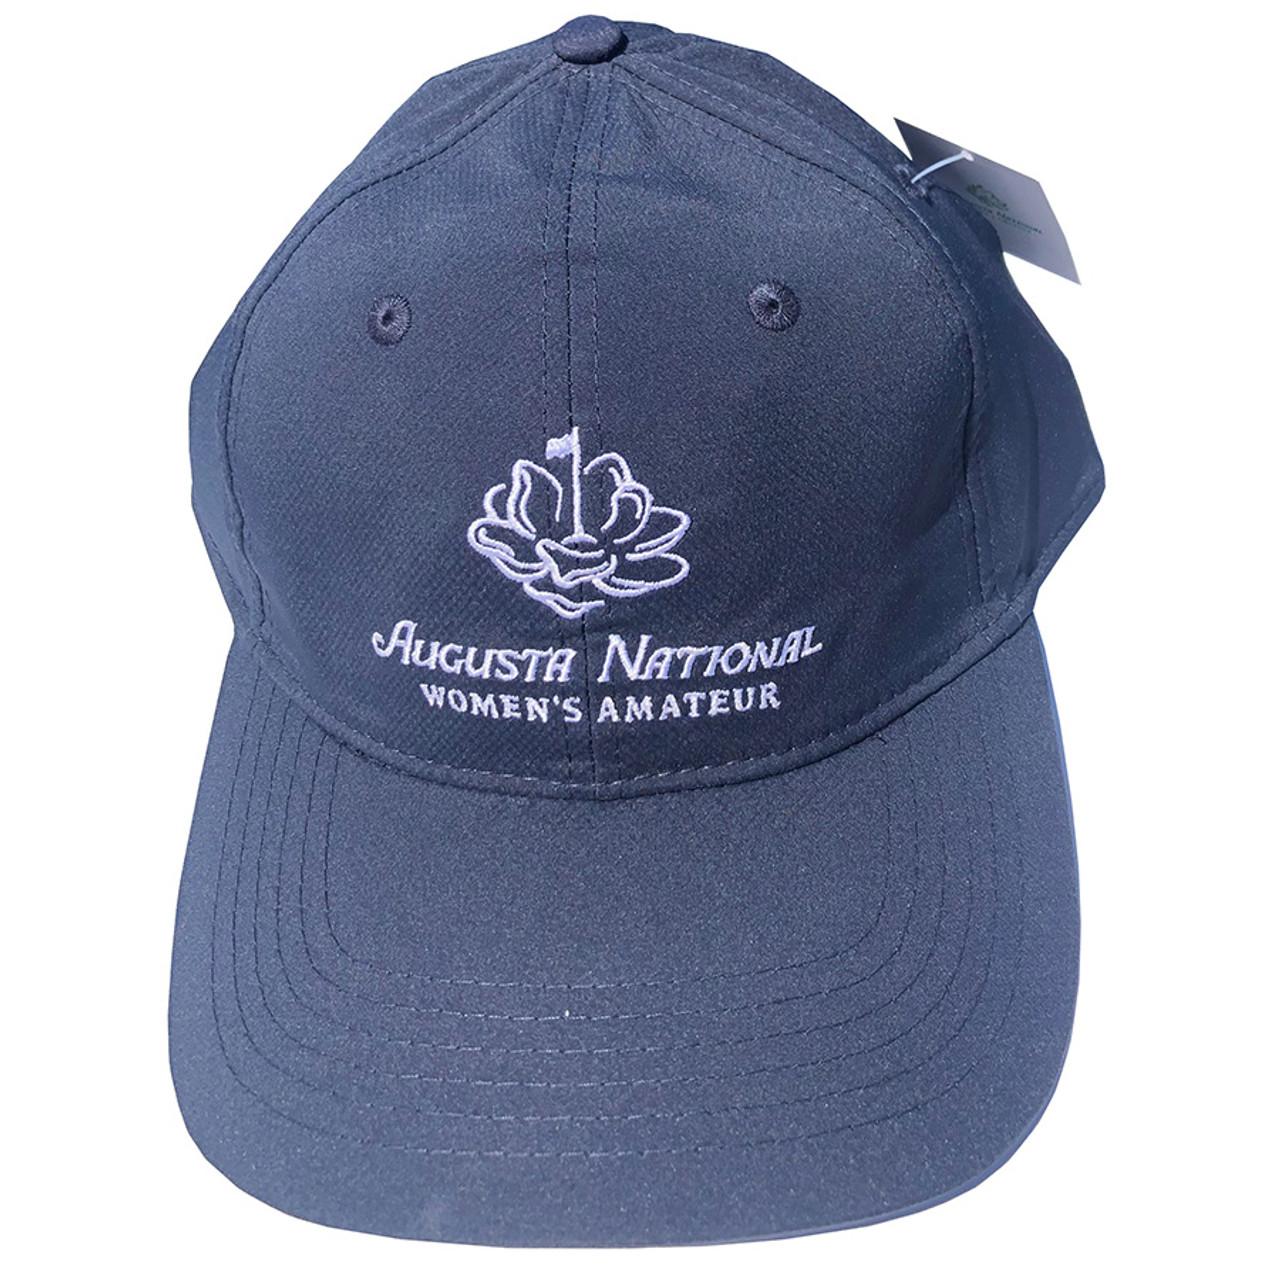 32b7ff38096 Men s Hat Augusta National Women s Amateur Golf Hat- Navy